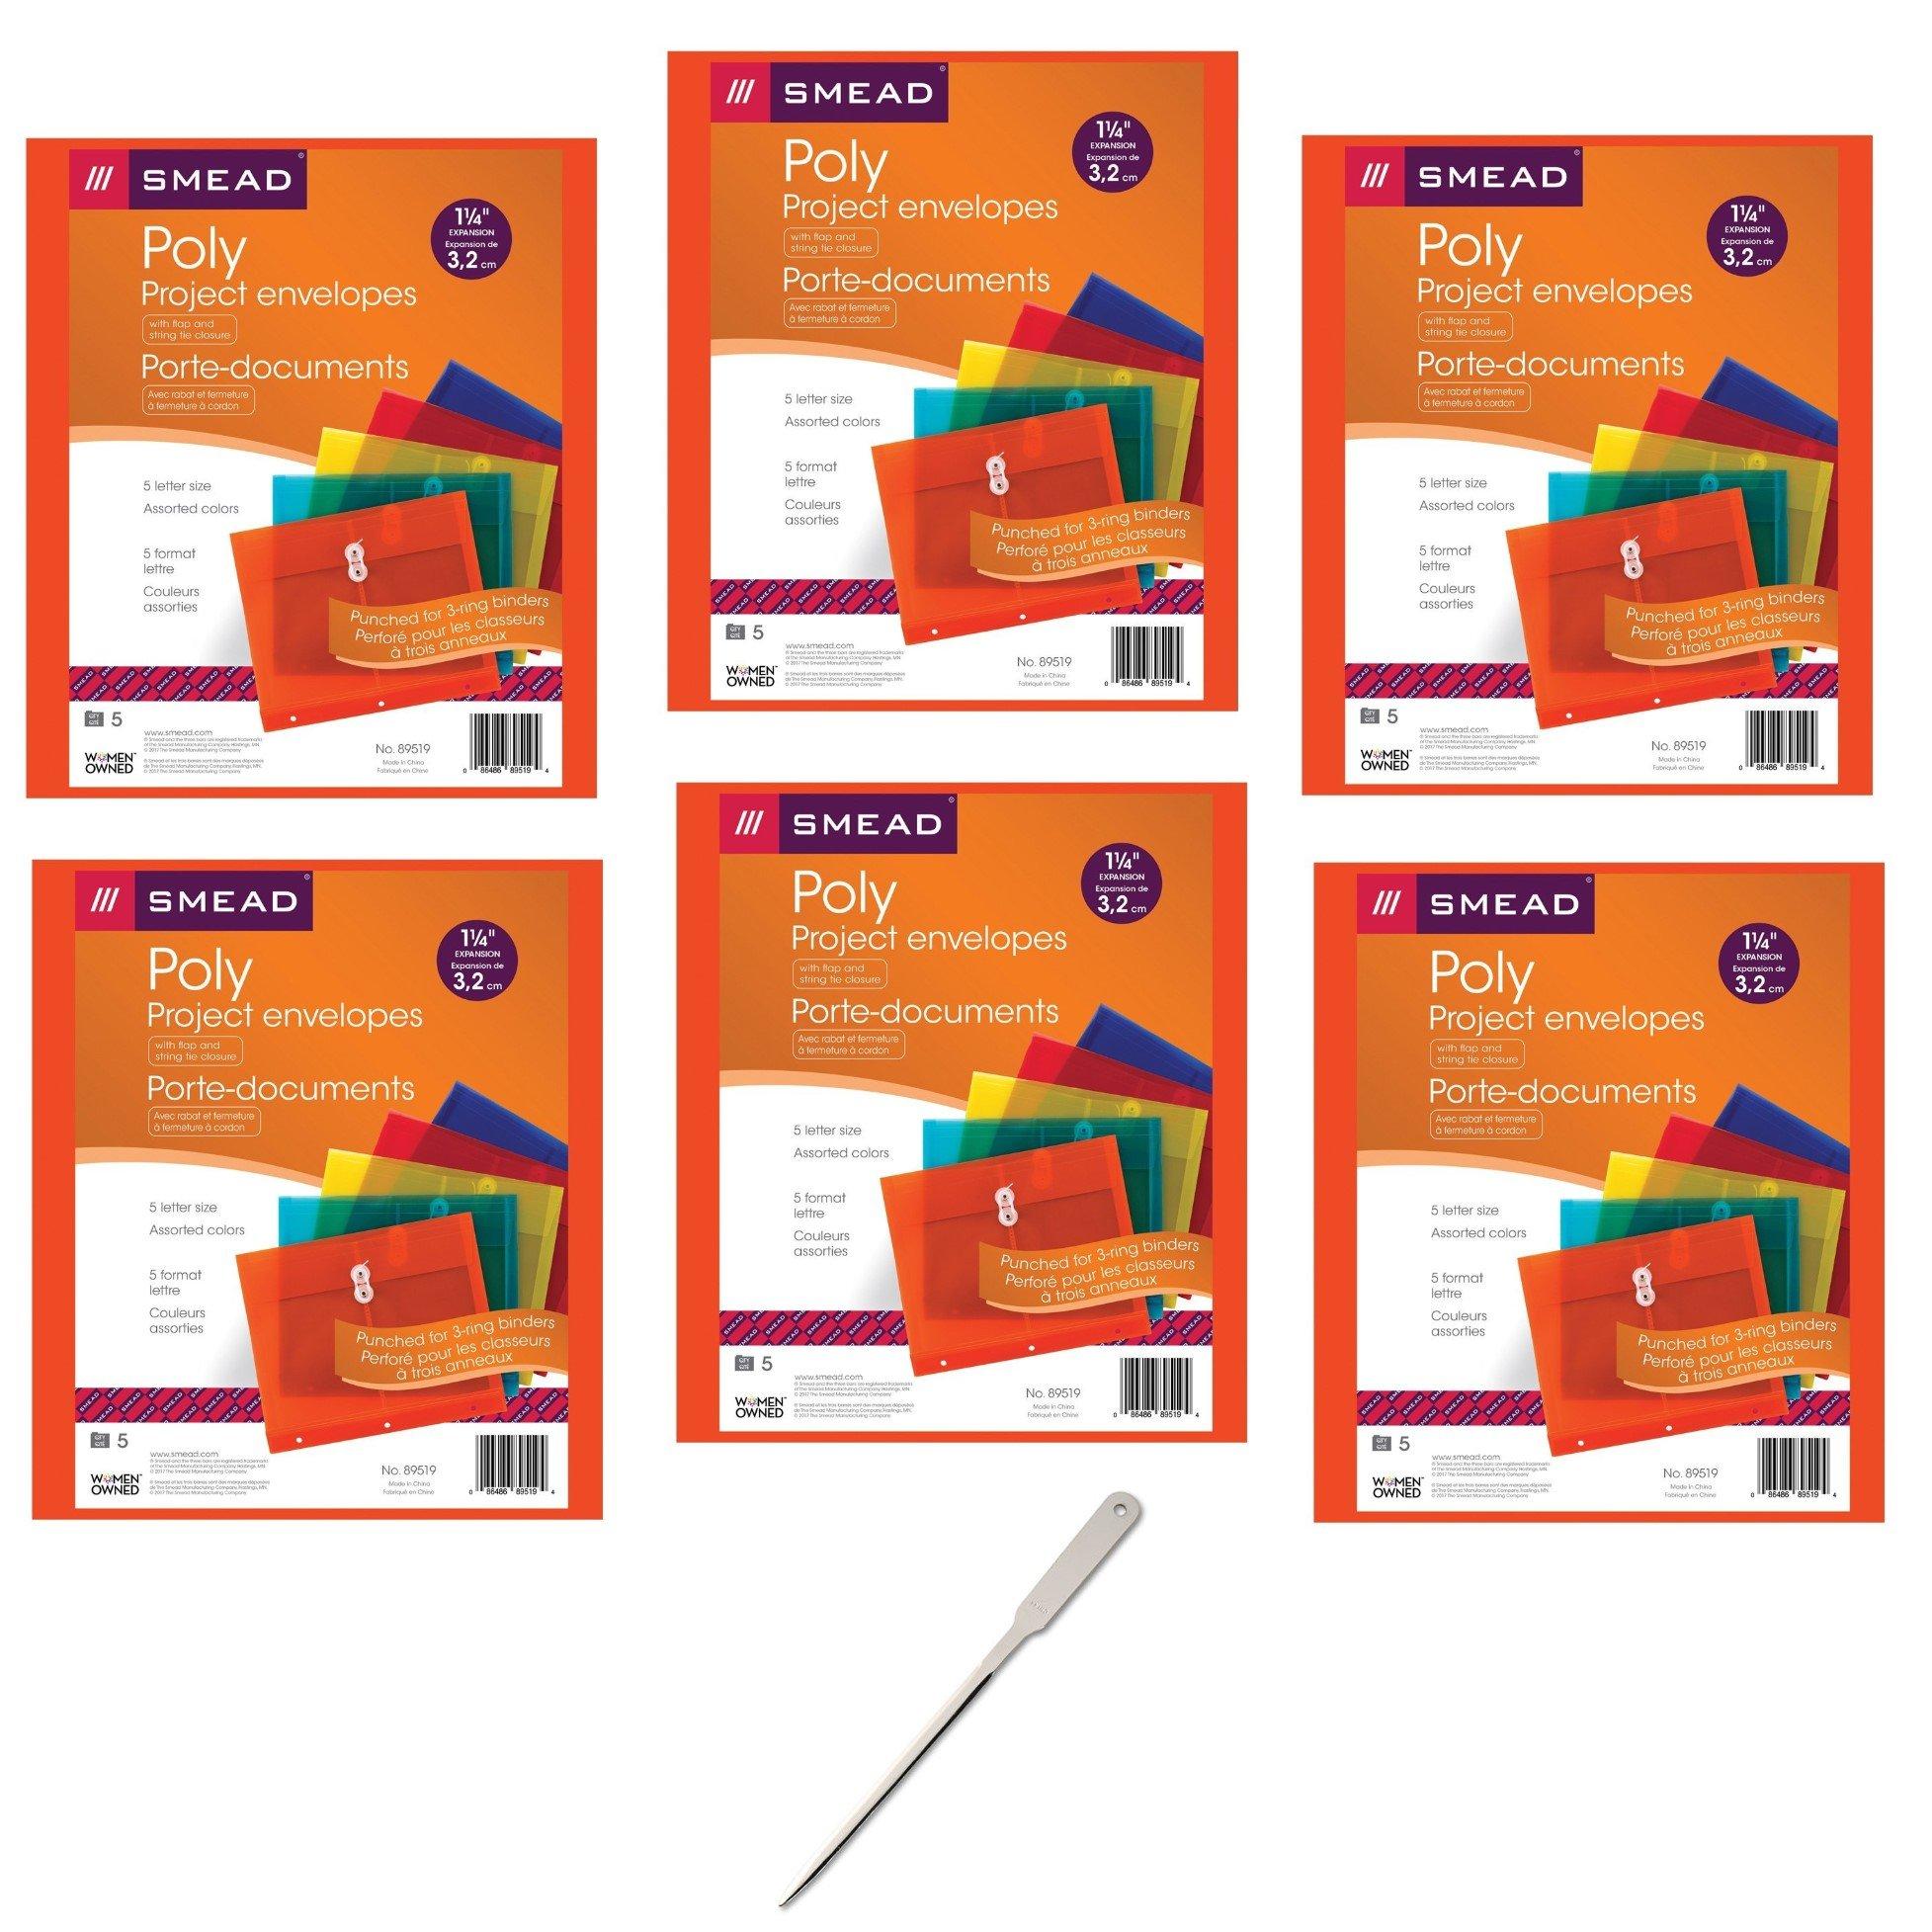 Smead Project Envelope, 1-1/4'' Expansion, String-Tie Closure, Side Load, Letter Size, 5 per Pack, 6 Pack, 30 Envelopes Total (89519) - Bundle Includes Universal Letter Opener